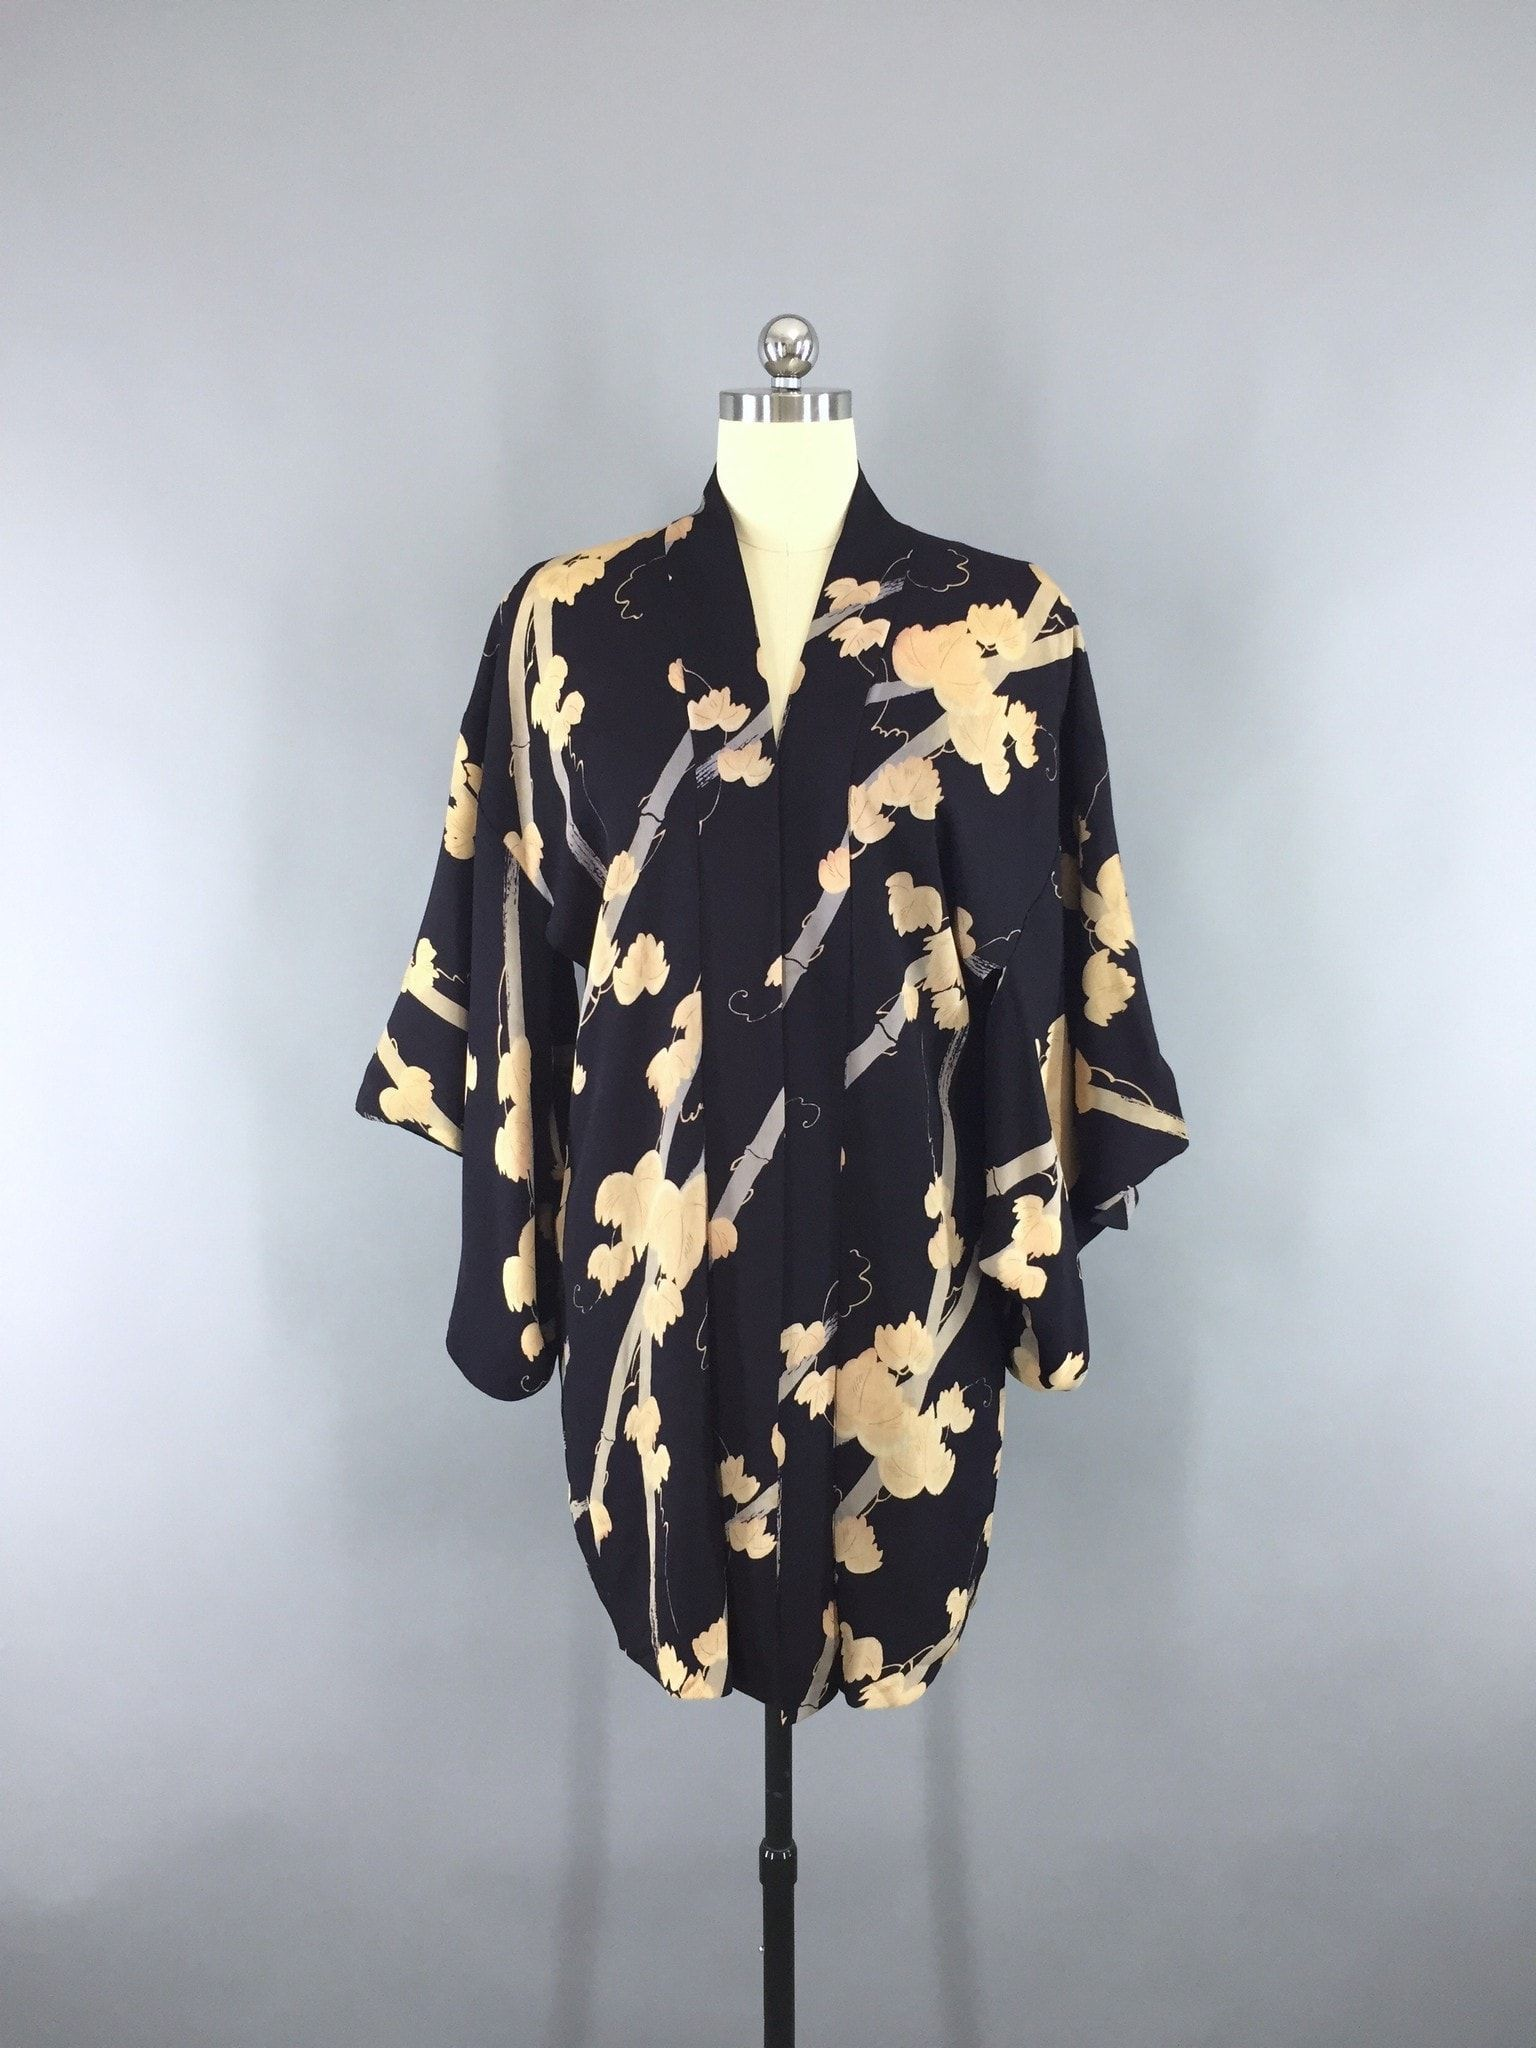 Vintage 1940s Haori Silk Kimono Jacket Cardigan with Navy Blue ...